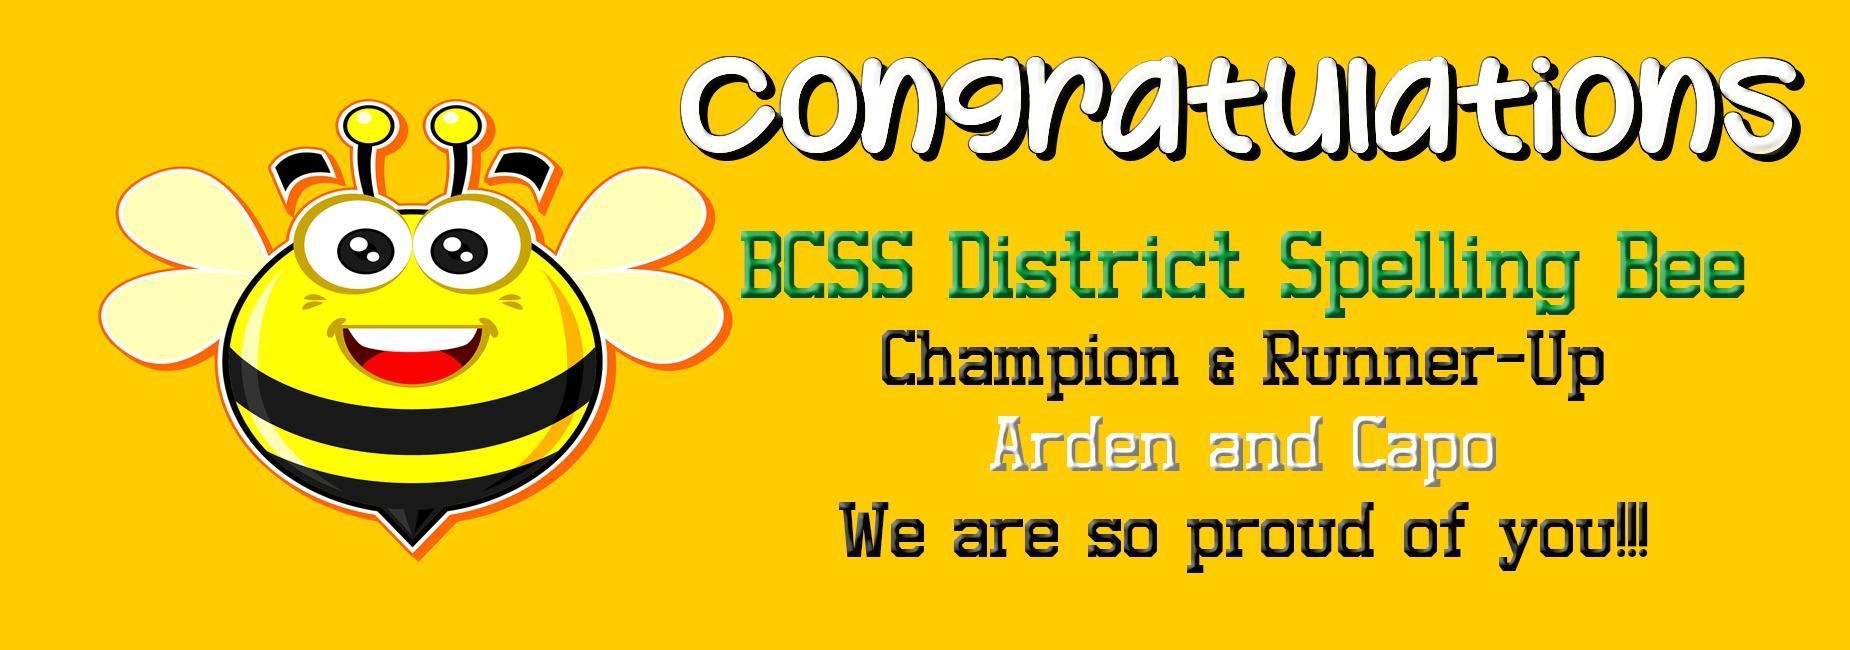 Congratulations District Spelling Bee Winners